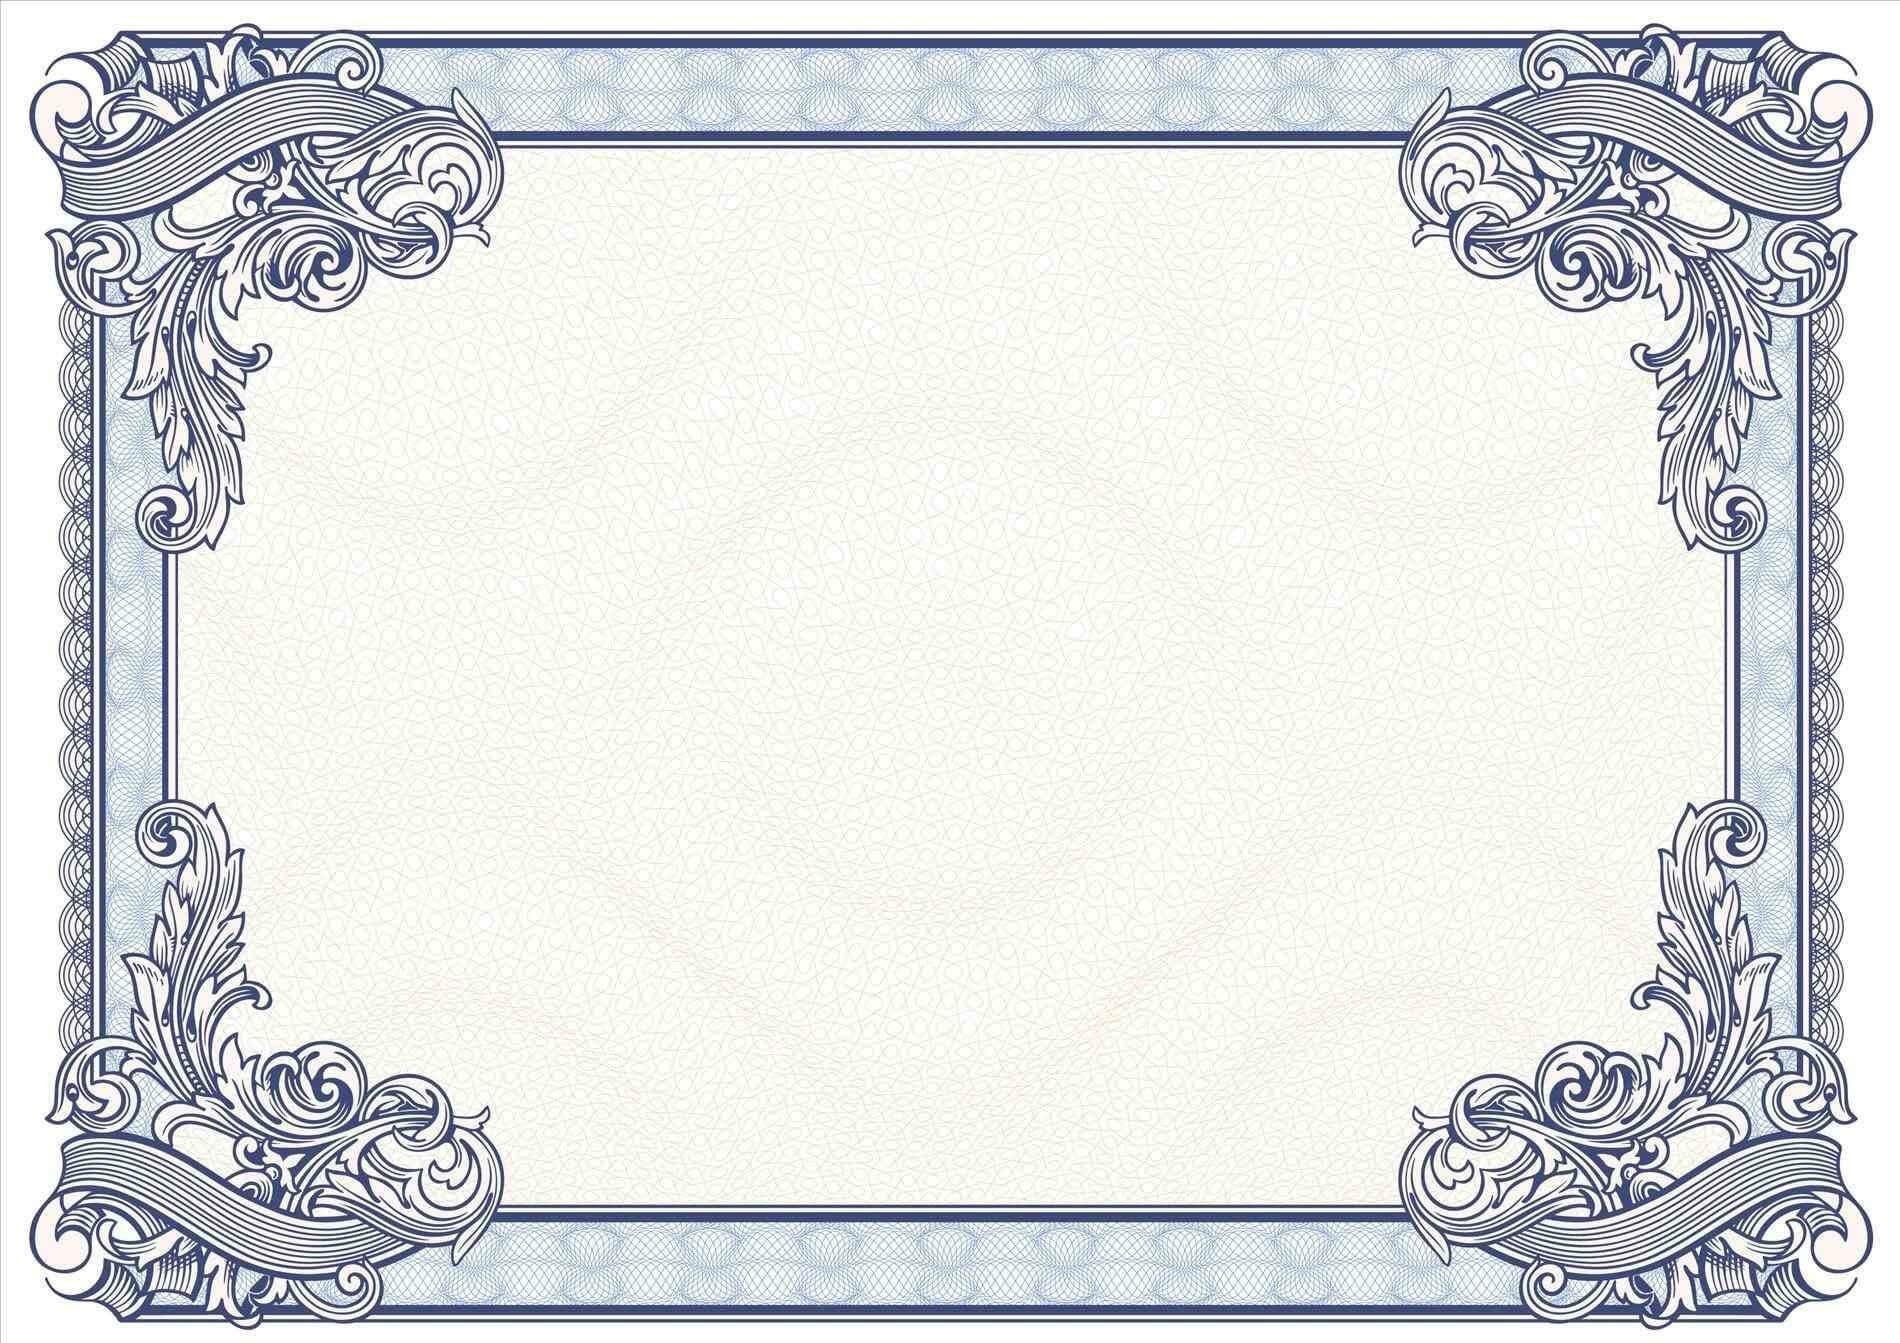 Certificate Borders Design Unique Certificate Border Design For Certificate Border Design Templates